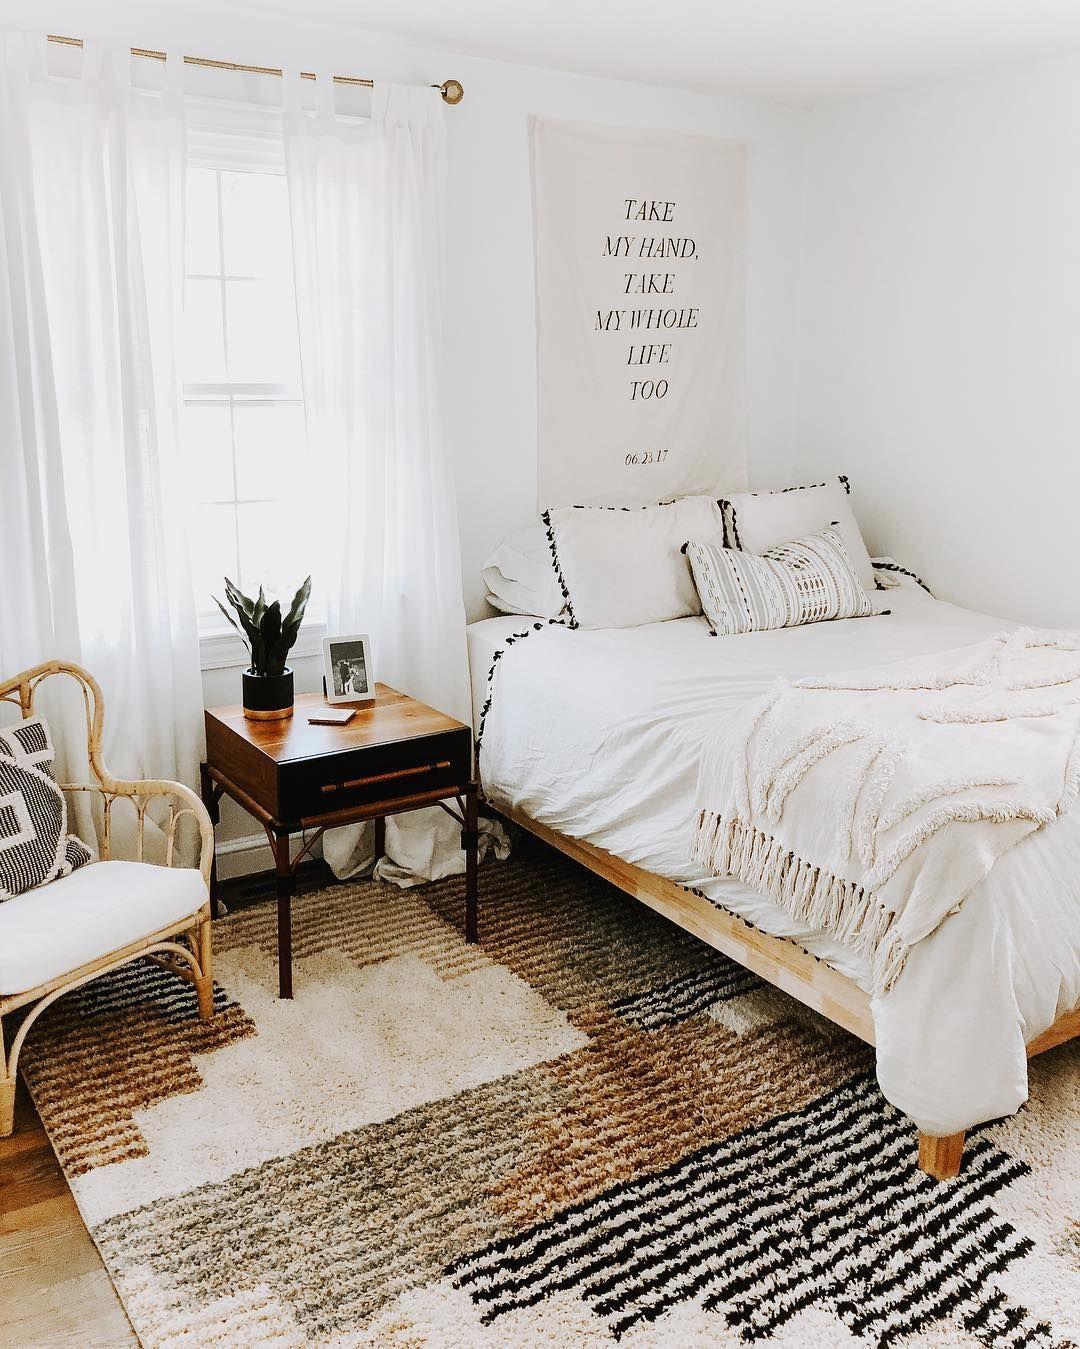 Rugs Bedouin Deco Blocks Off White Area Rug Rugs In Living Room Bedroom Area Rug Boho Living Room